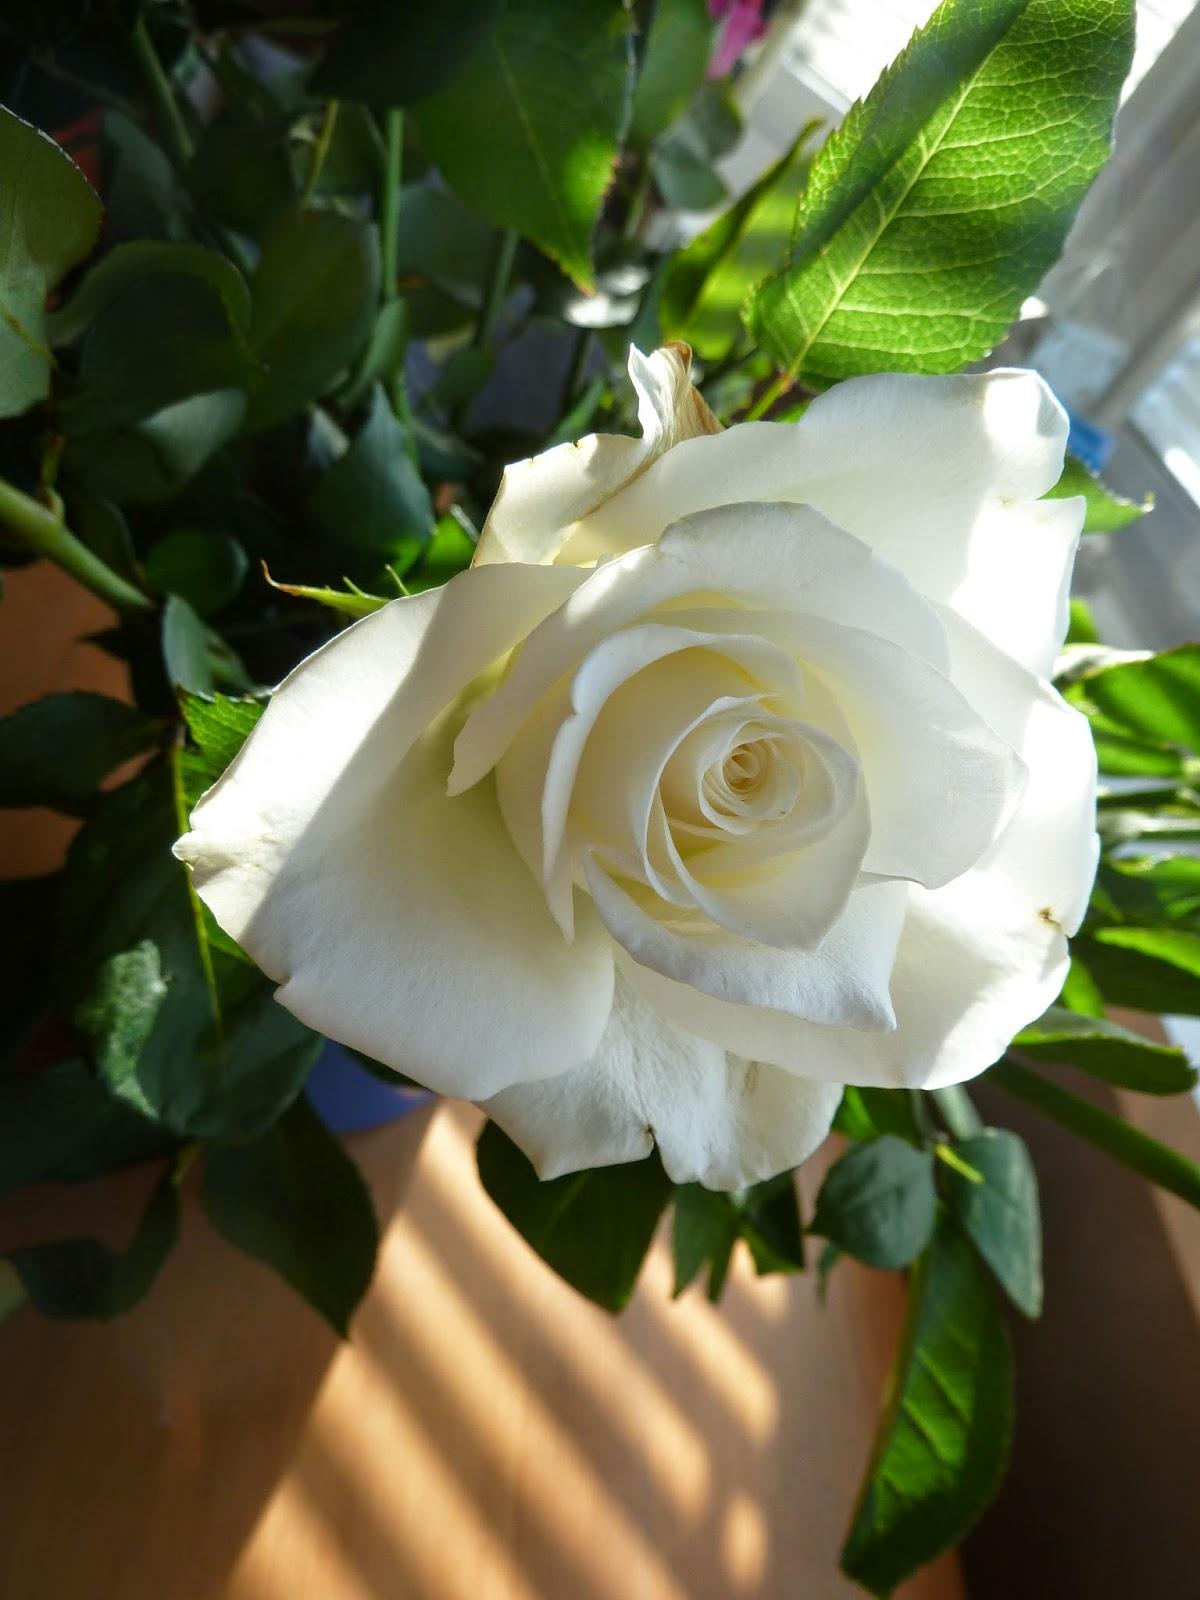 White rose in shaft of sun through blinds